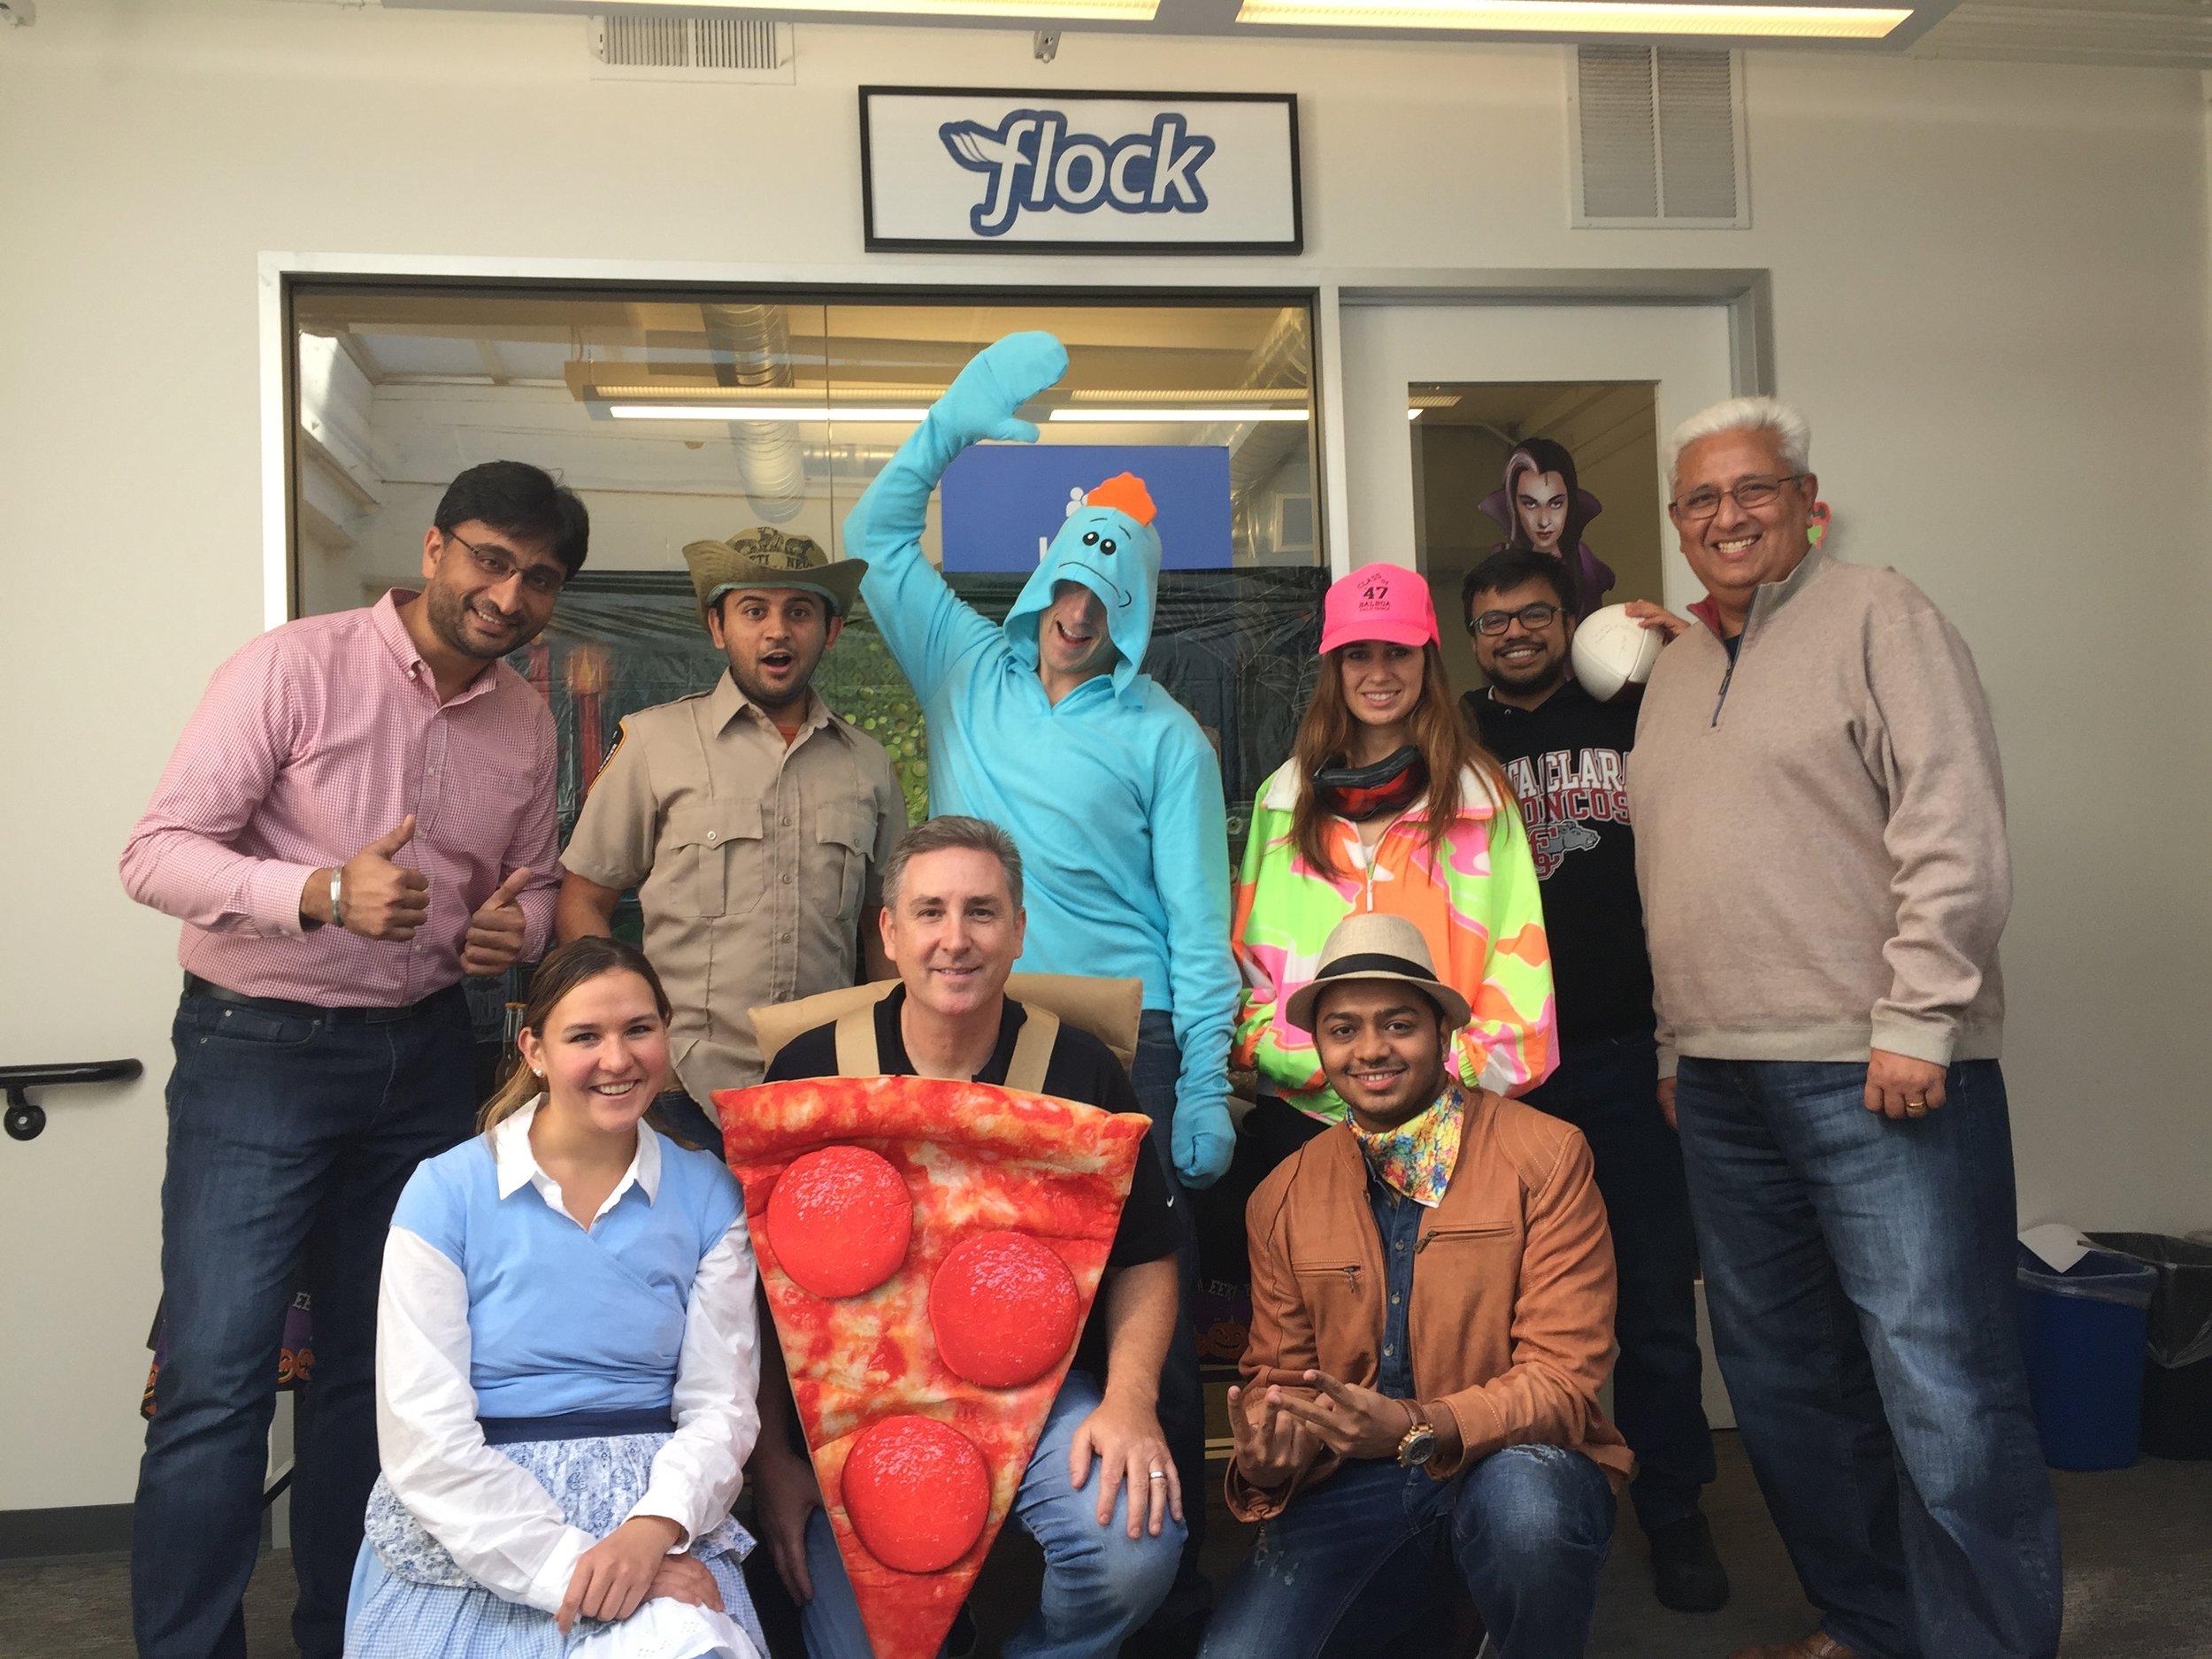 Celebrating Halloween at Flock!